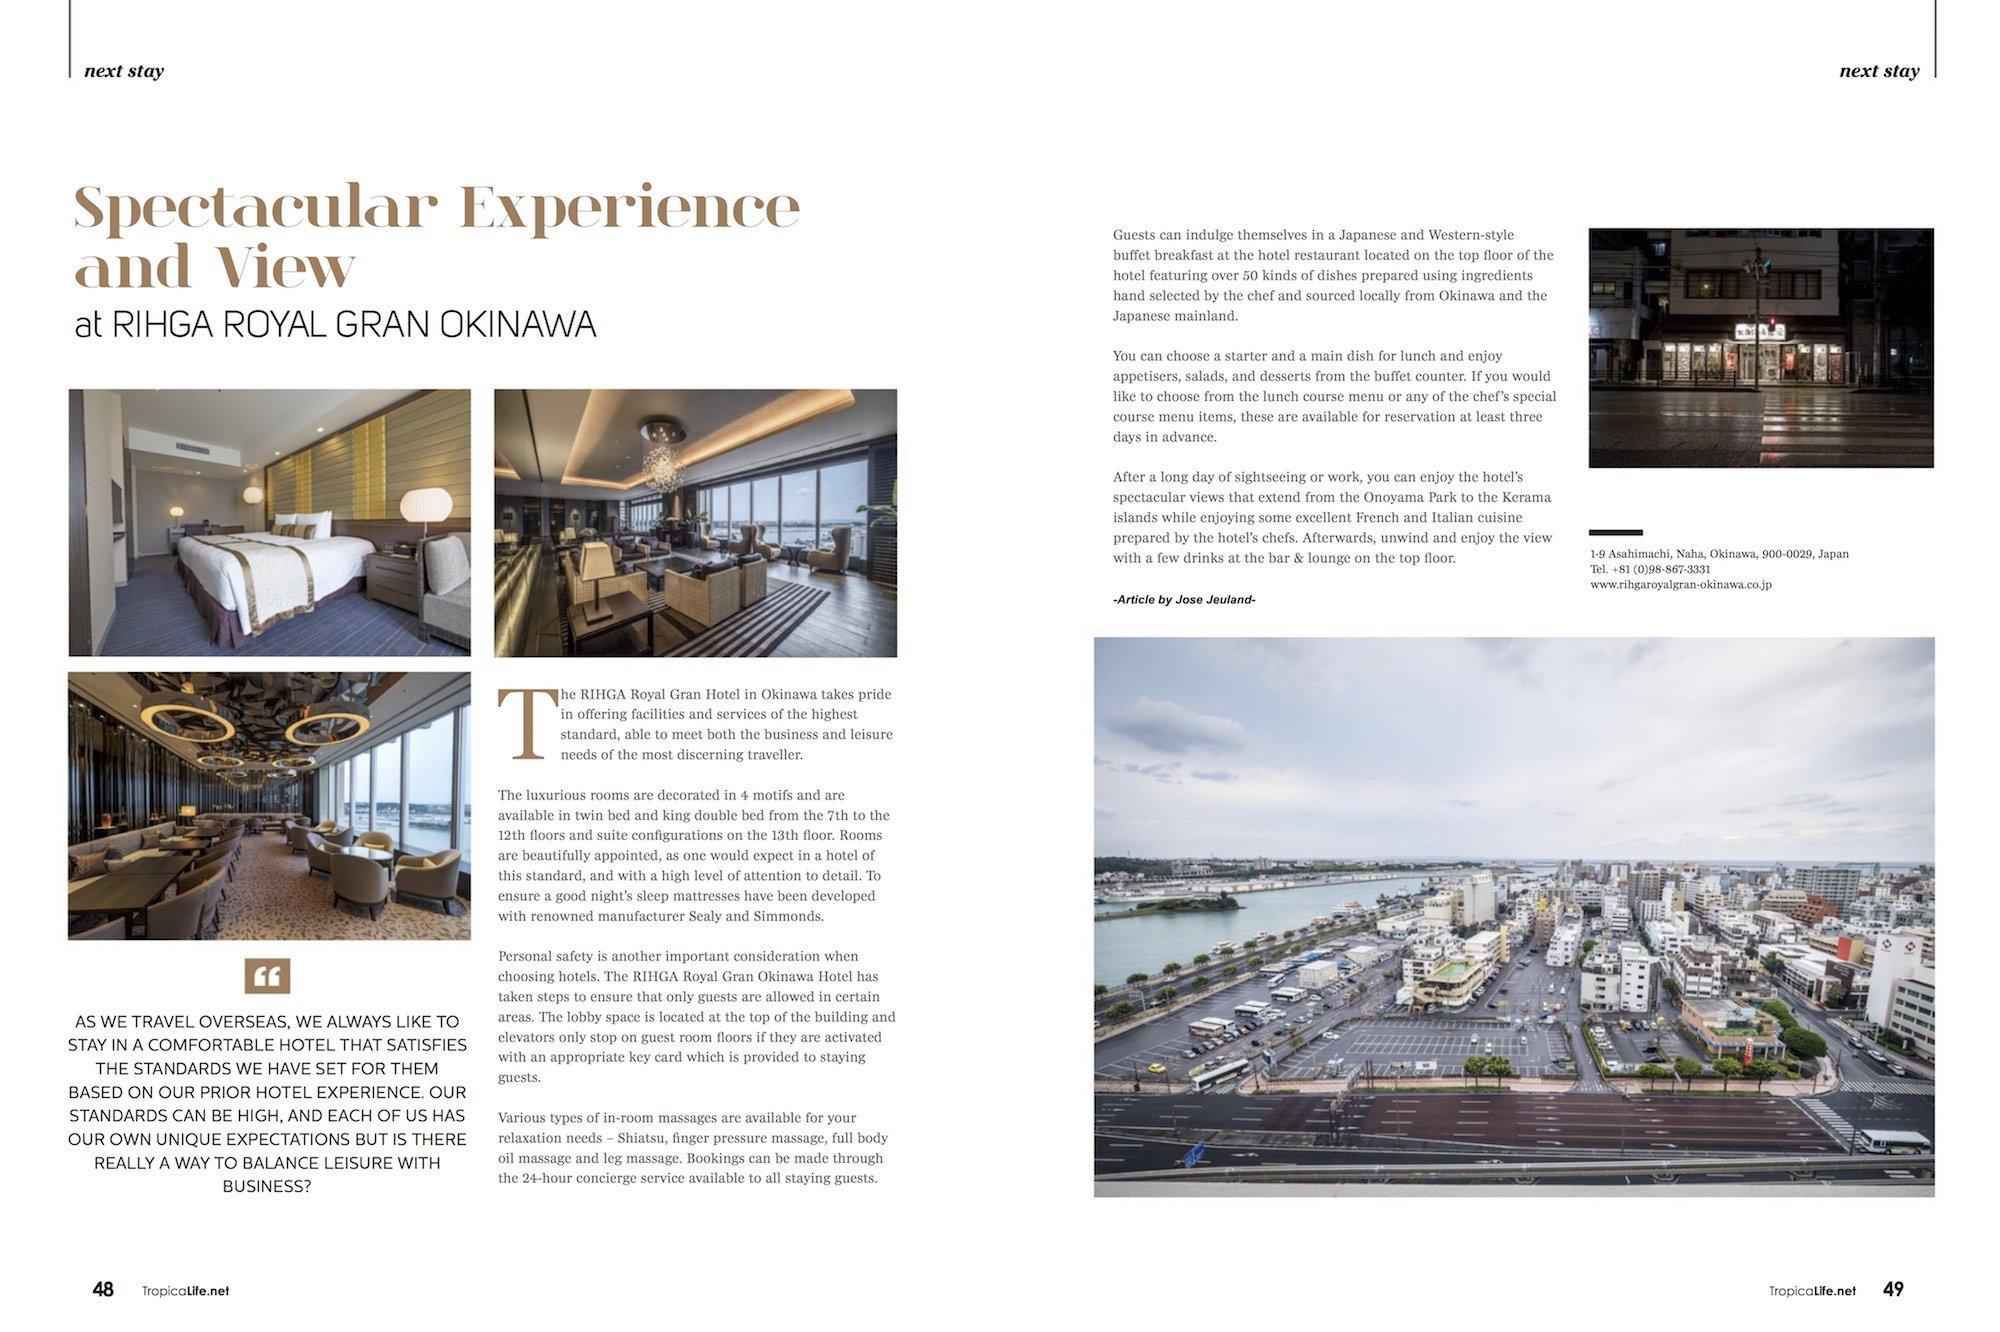 Tropical Life Magazine Travel Journey Okinawa Japan Jose Jeuland Hotel RIHGA ROYAL GRAN OKINAWA